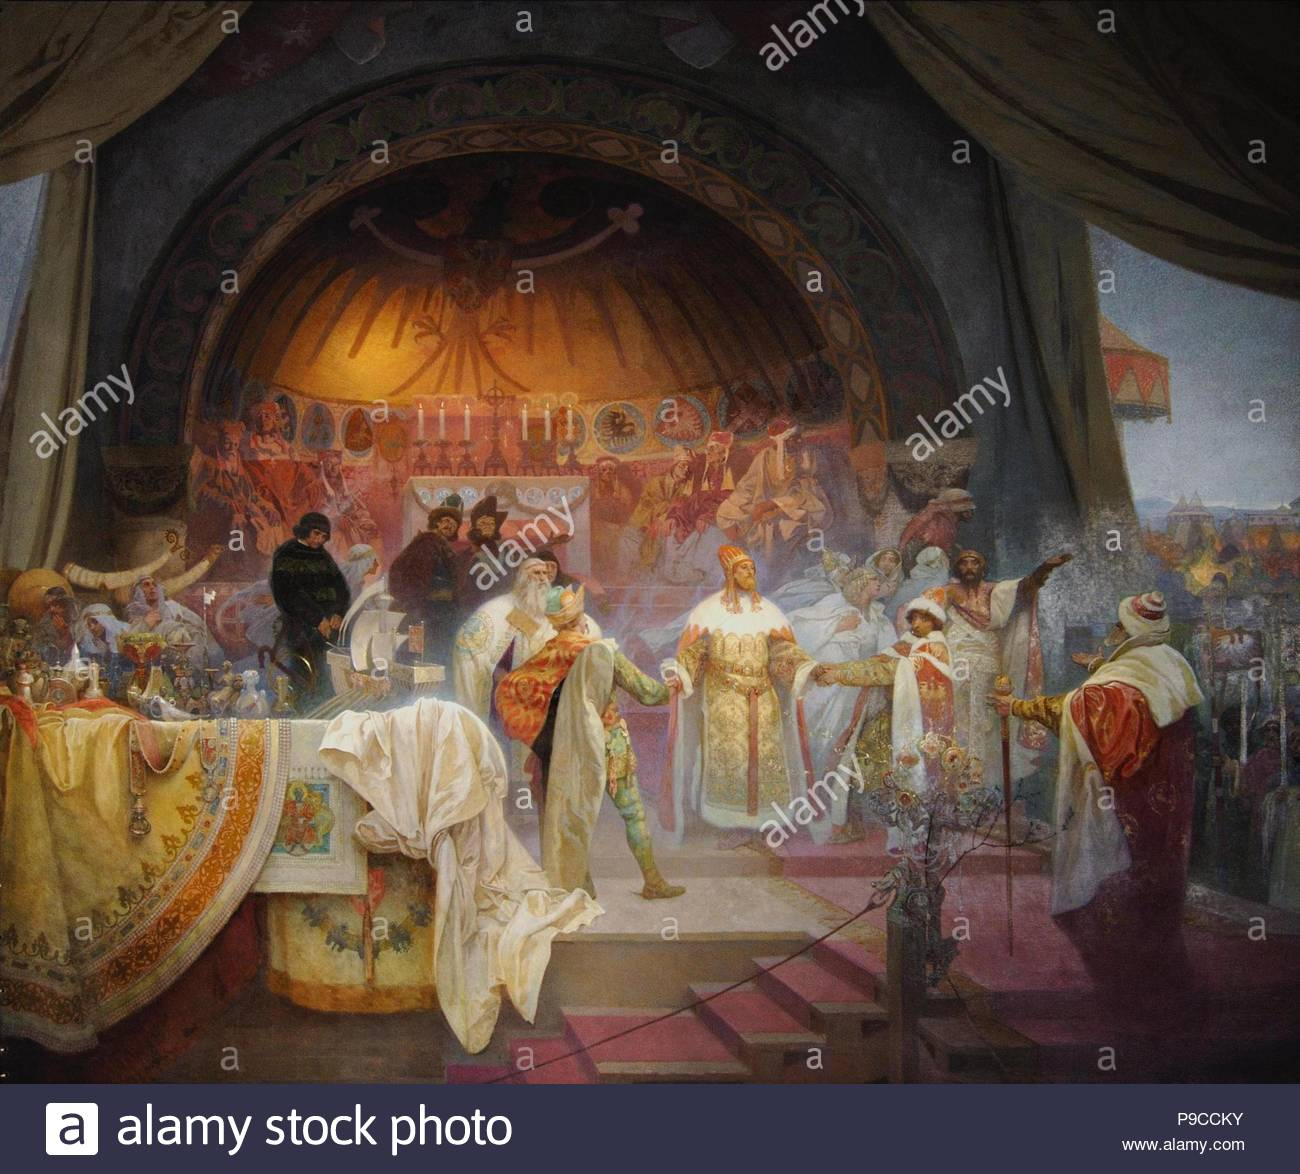 Ottokar II of Bohemia. The Union of Slavic Dynasties (The cycle The Slav Epic). Museum: City Gallery Prague. - Stock Image